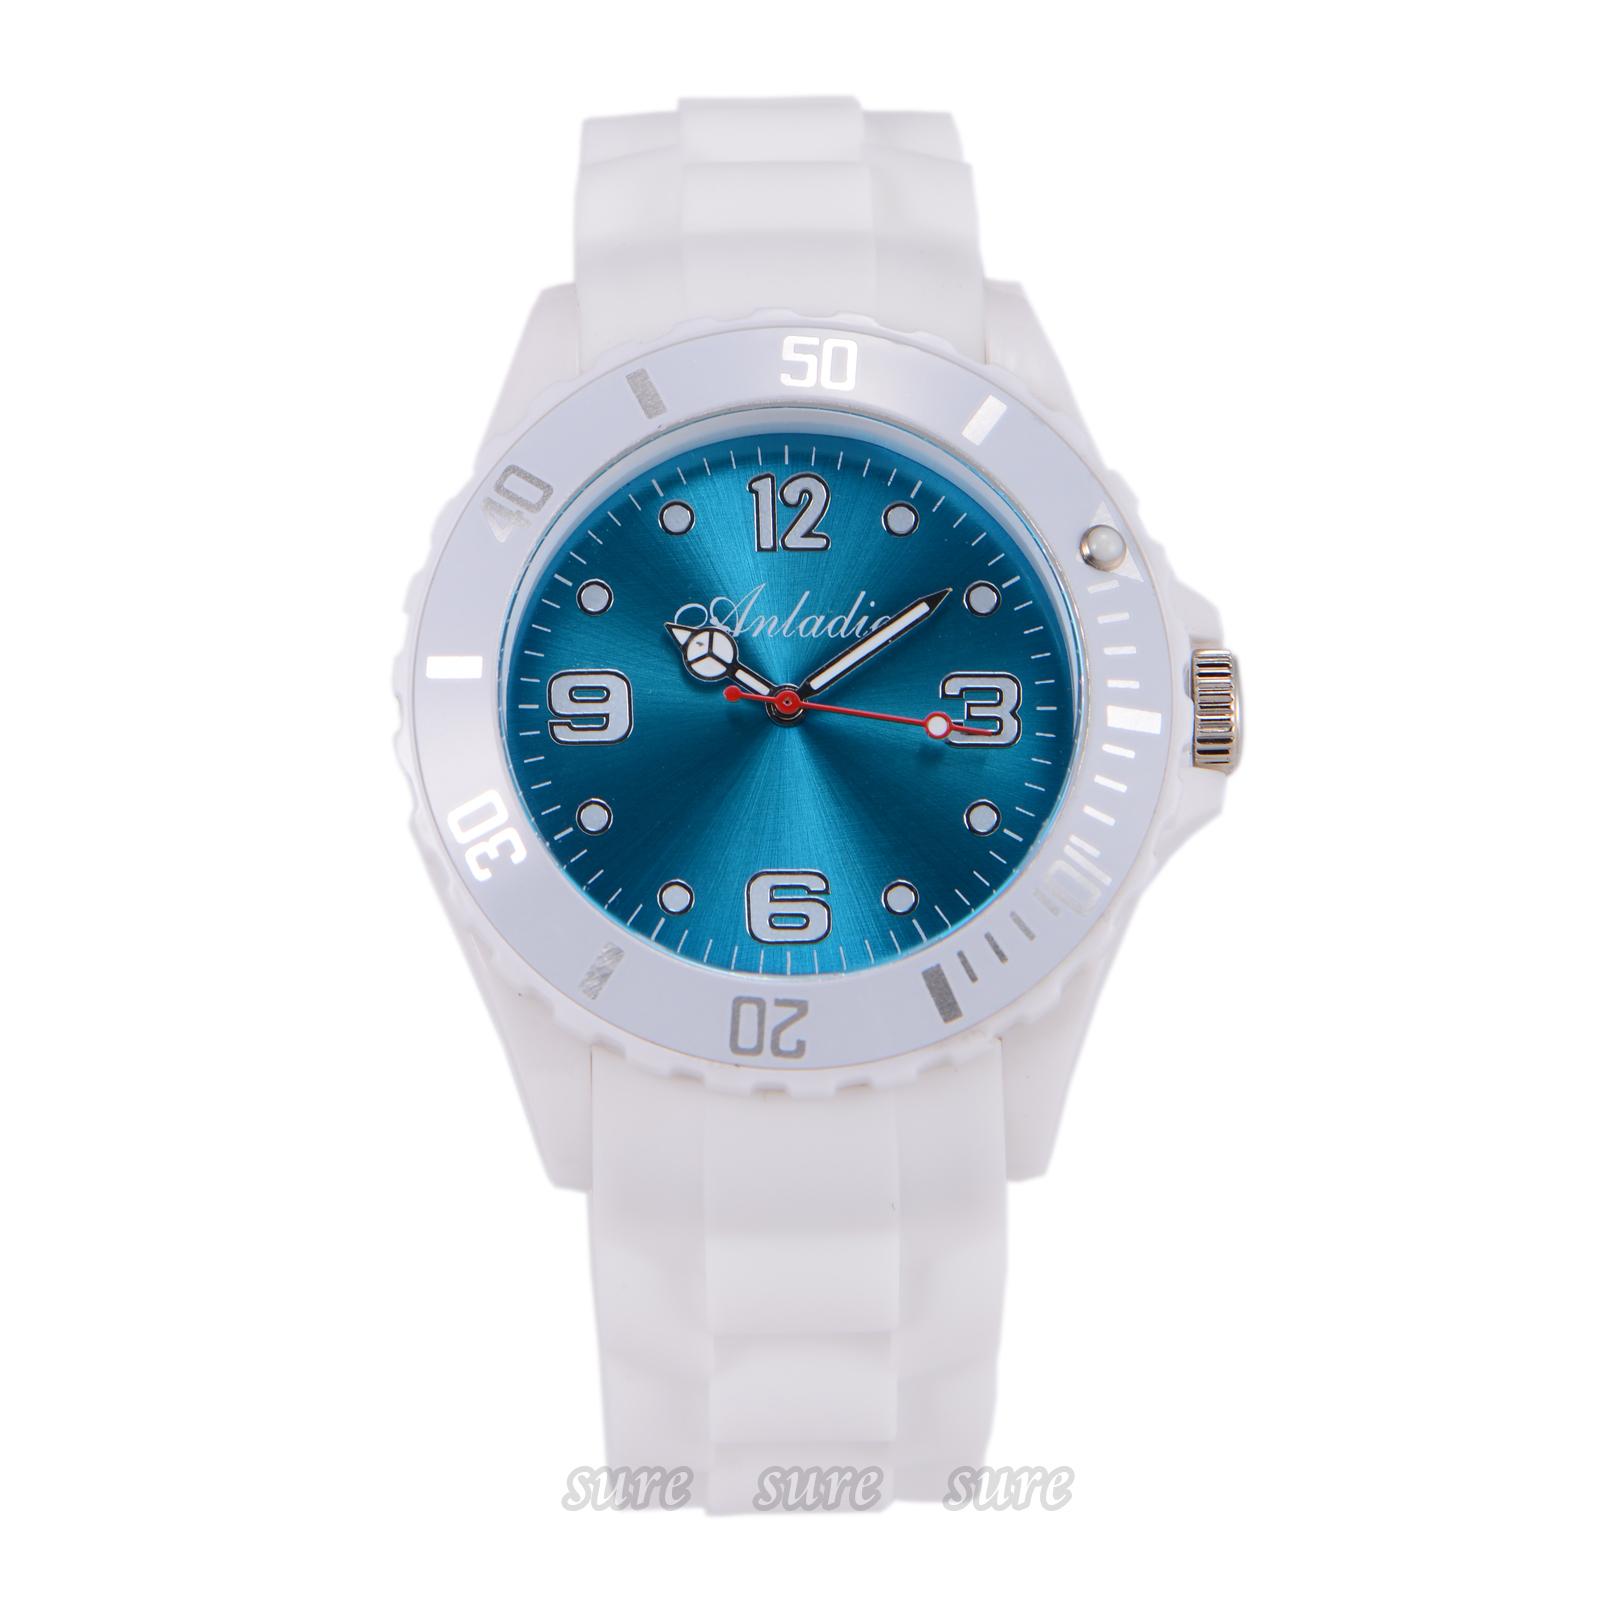 Unisex-Damen-Herren-Bunte-Silikon-Sport-Quarzuhr-Armbanduhr-Watch-Geschenk-Etui